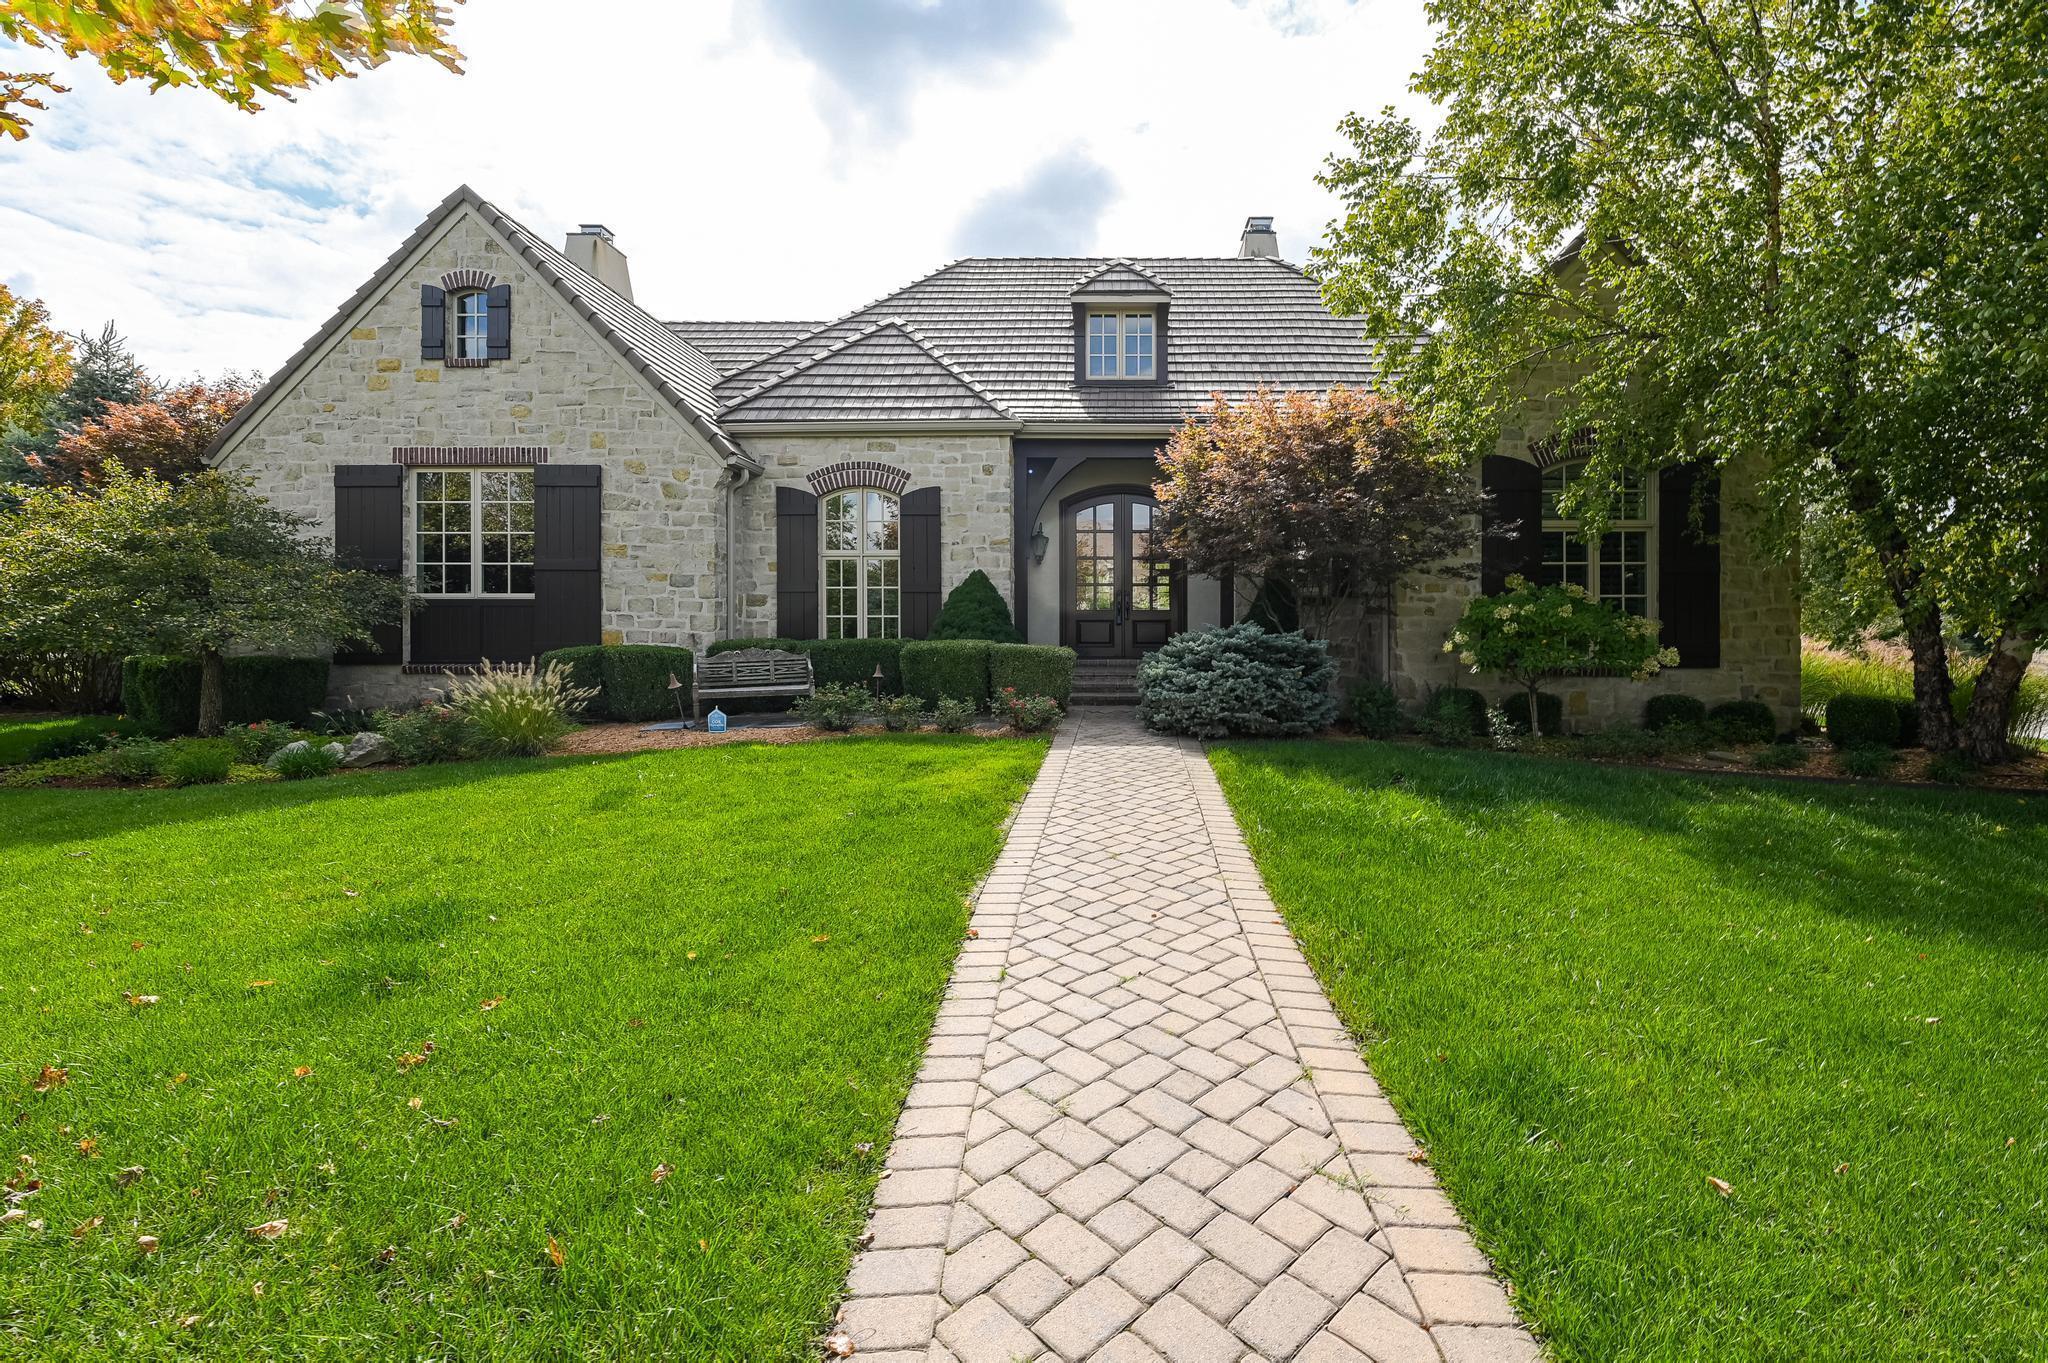 A custom VanBuskirk built partial stone ranch patio home. 4 bedrooms, walk-in closets, 4 ensuite bat